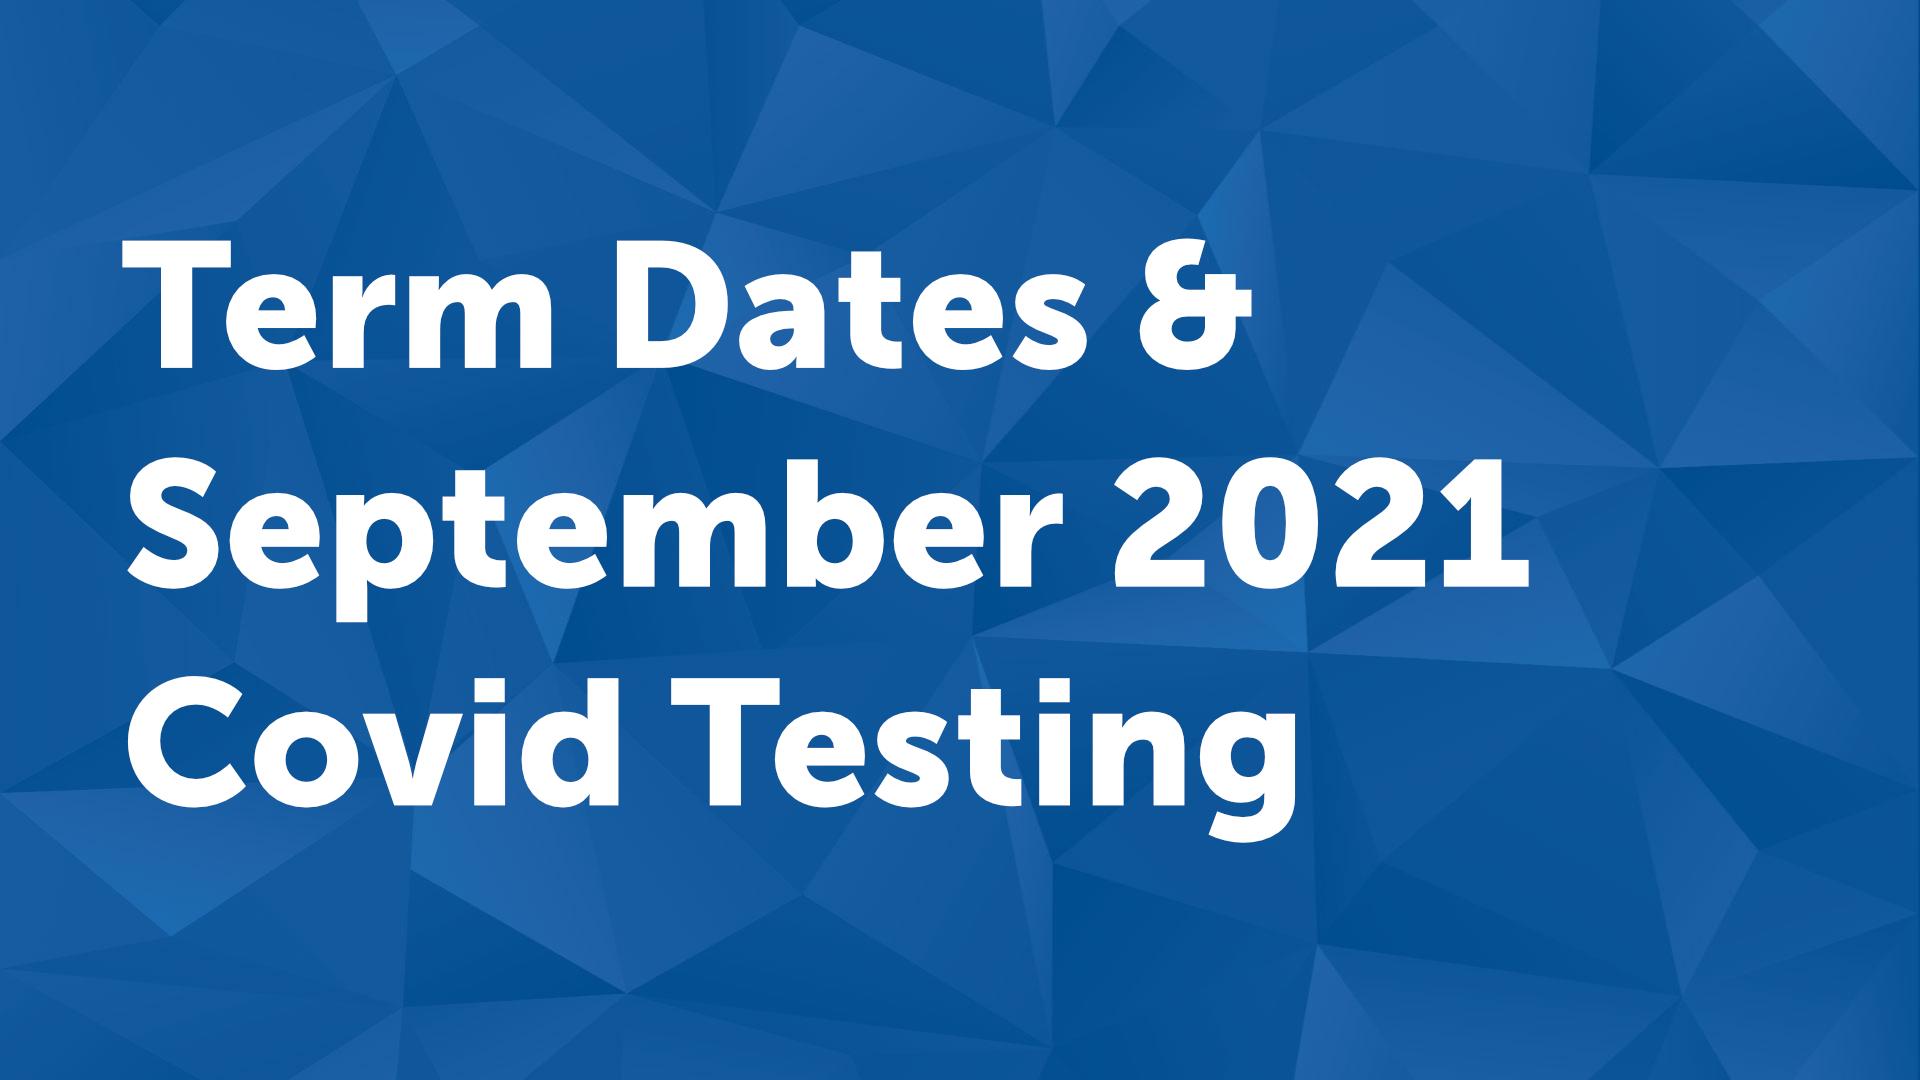 Term Dates & September 2021 Covid Testing